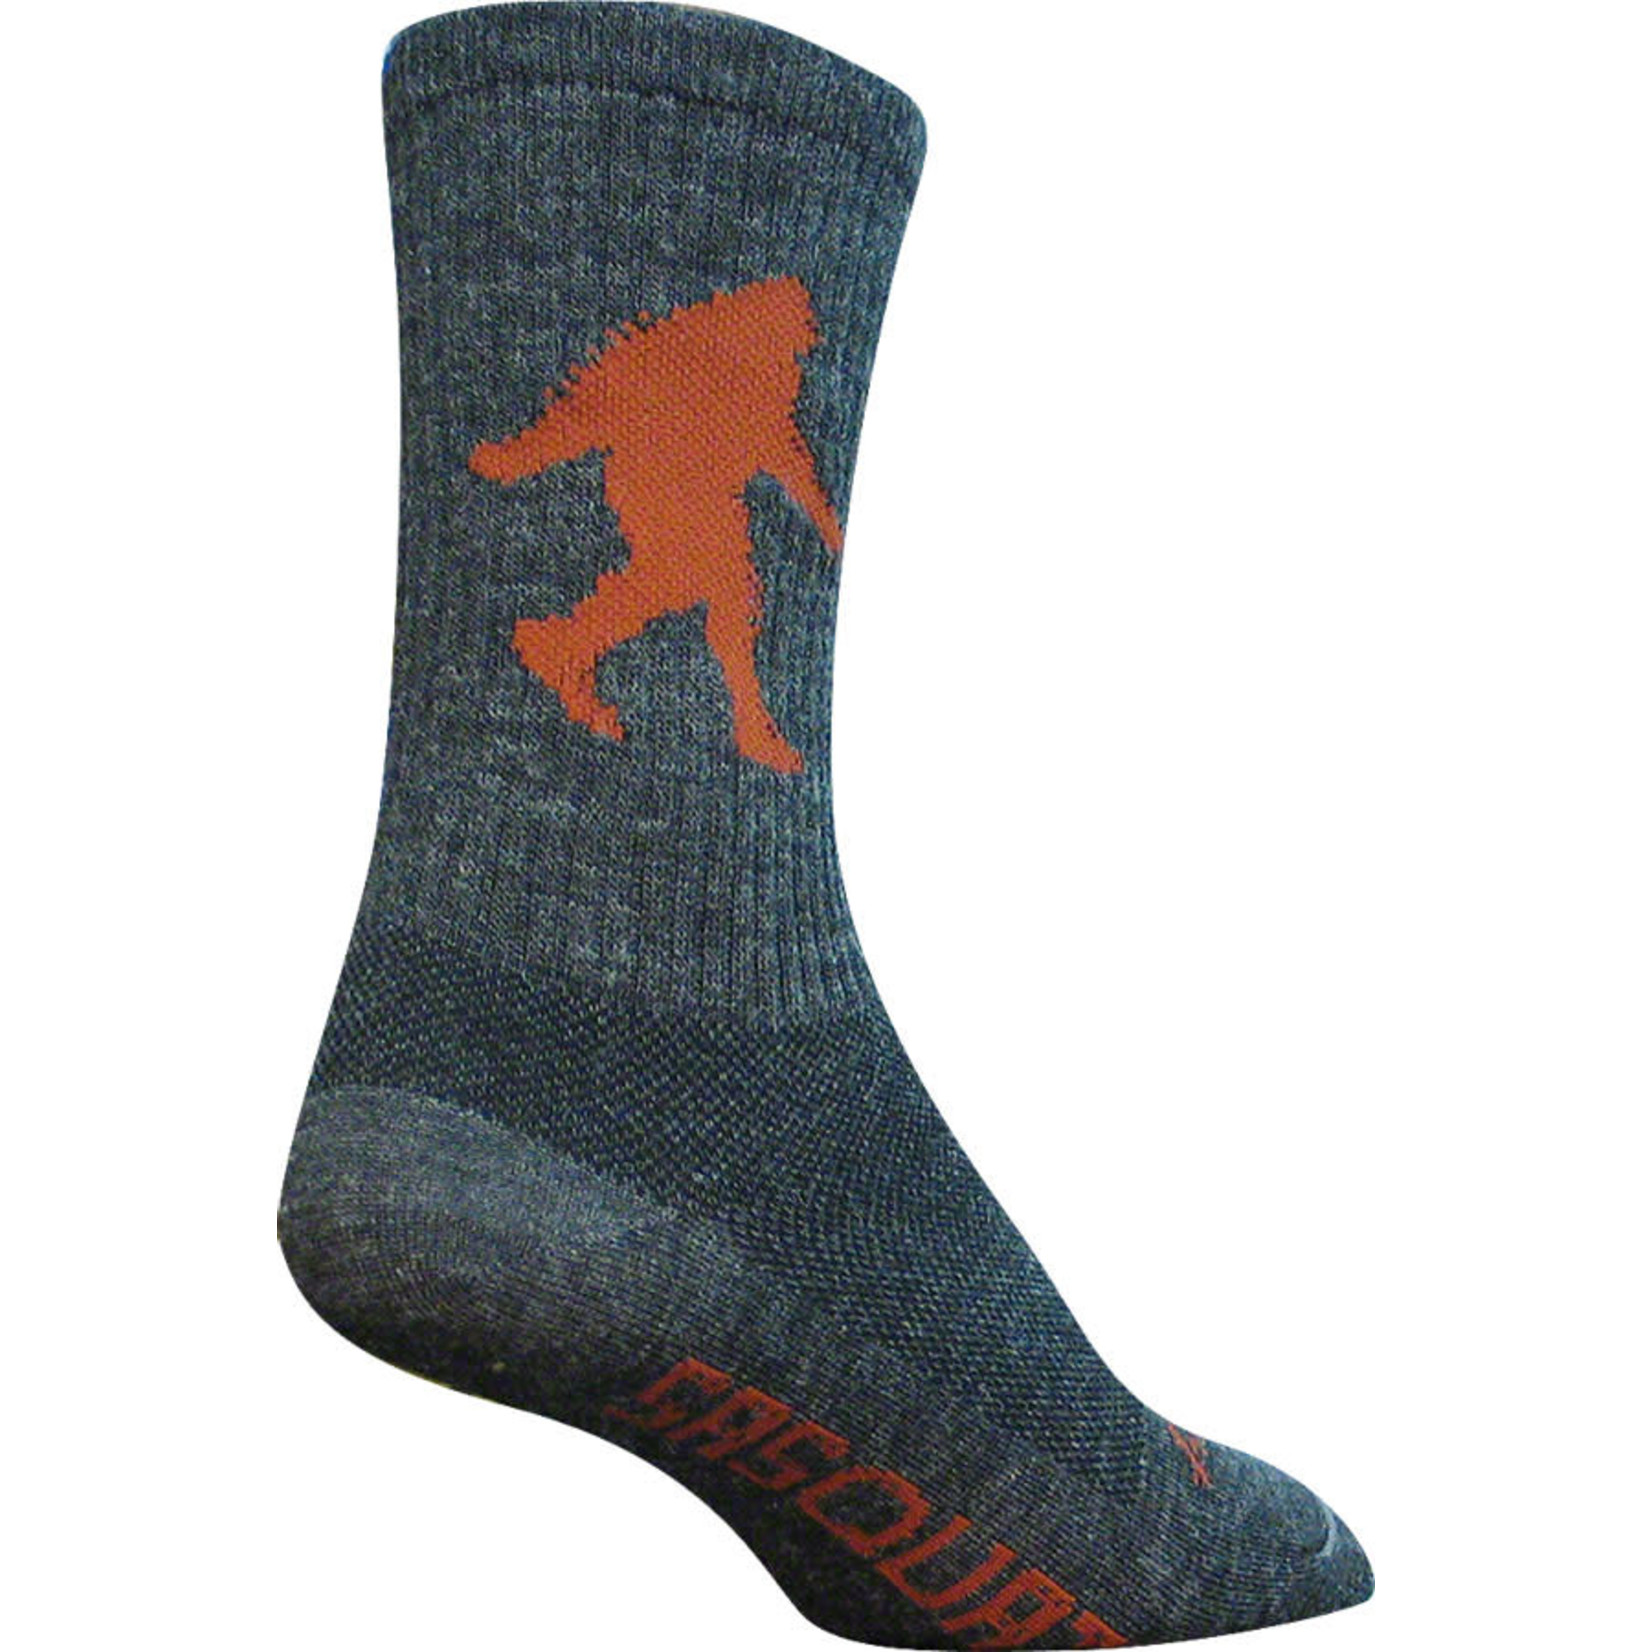 "SockGuy SockGuy Wool Sasquatch 6"" Crew Sock - Gray Large/X-Large"